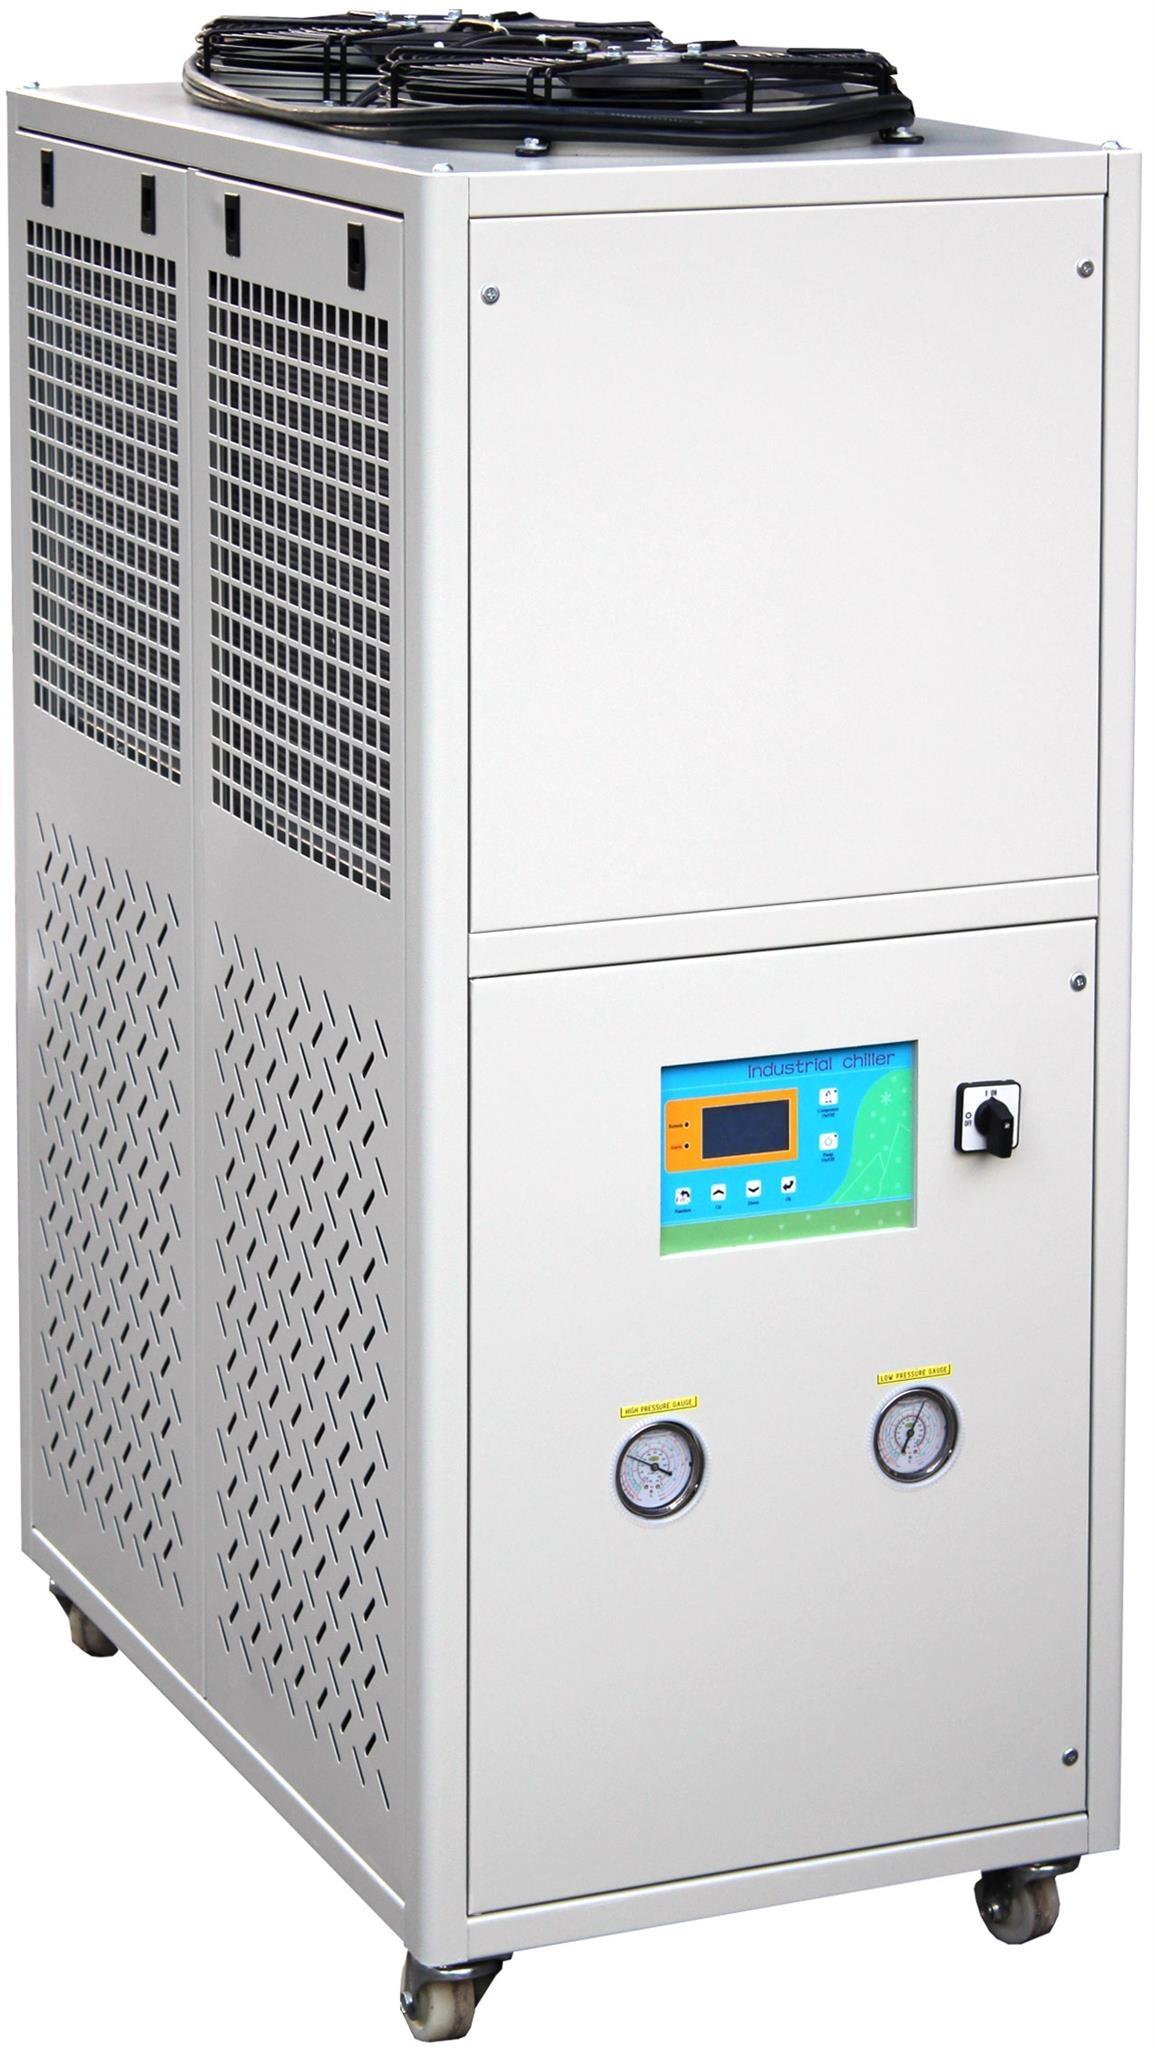 Ai 10°C to 25°C 33L/Min 35L Capacity Recirculating Chiller